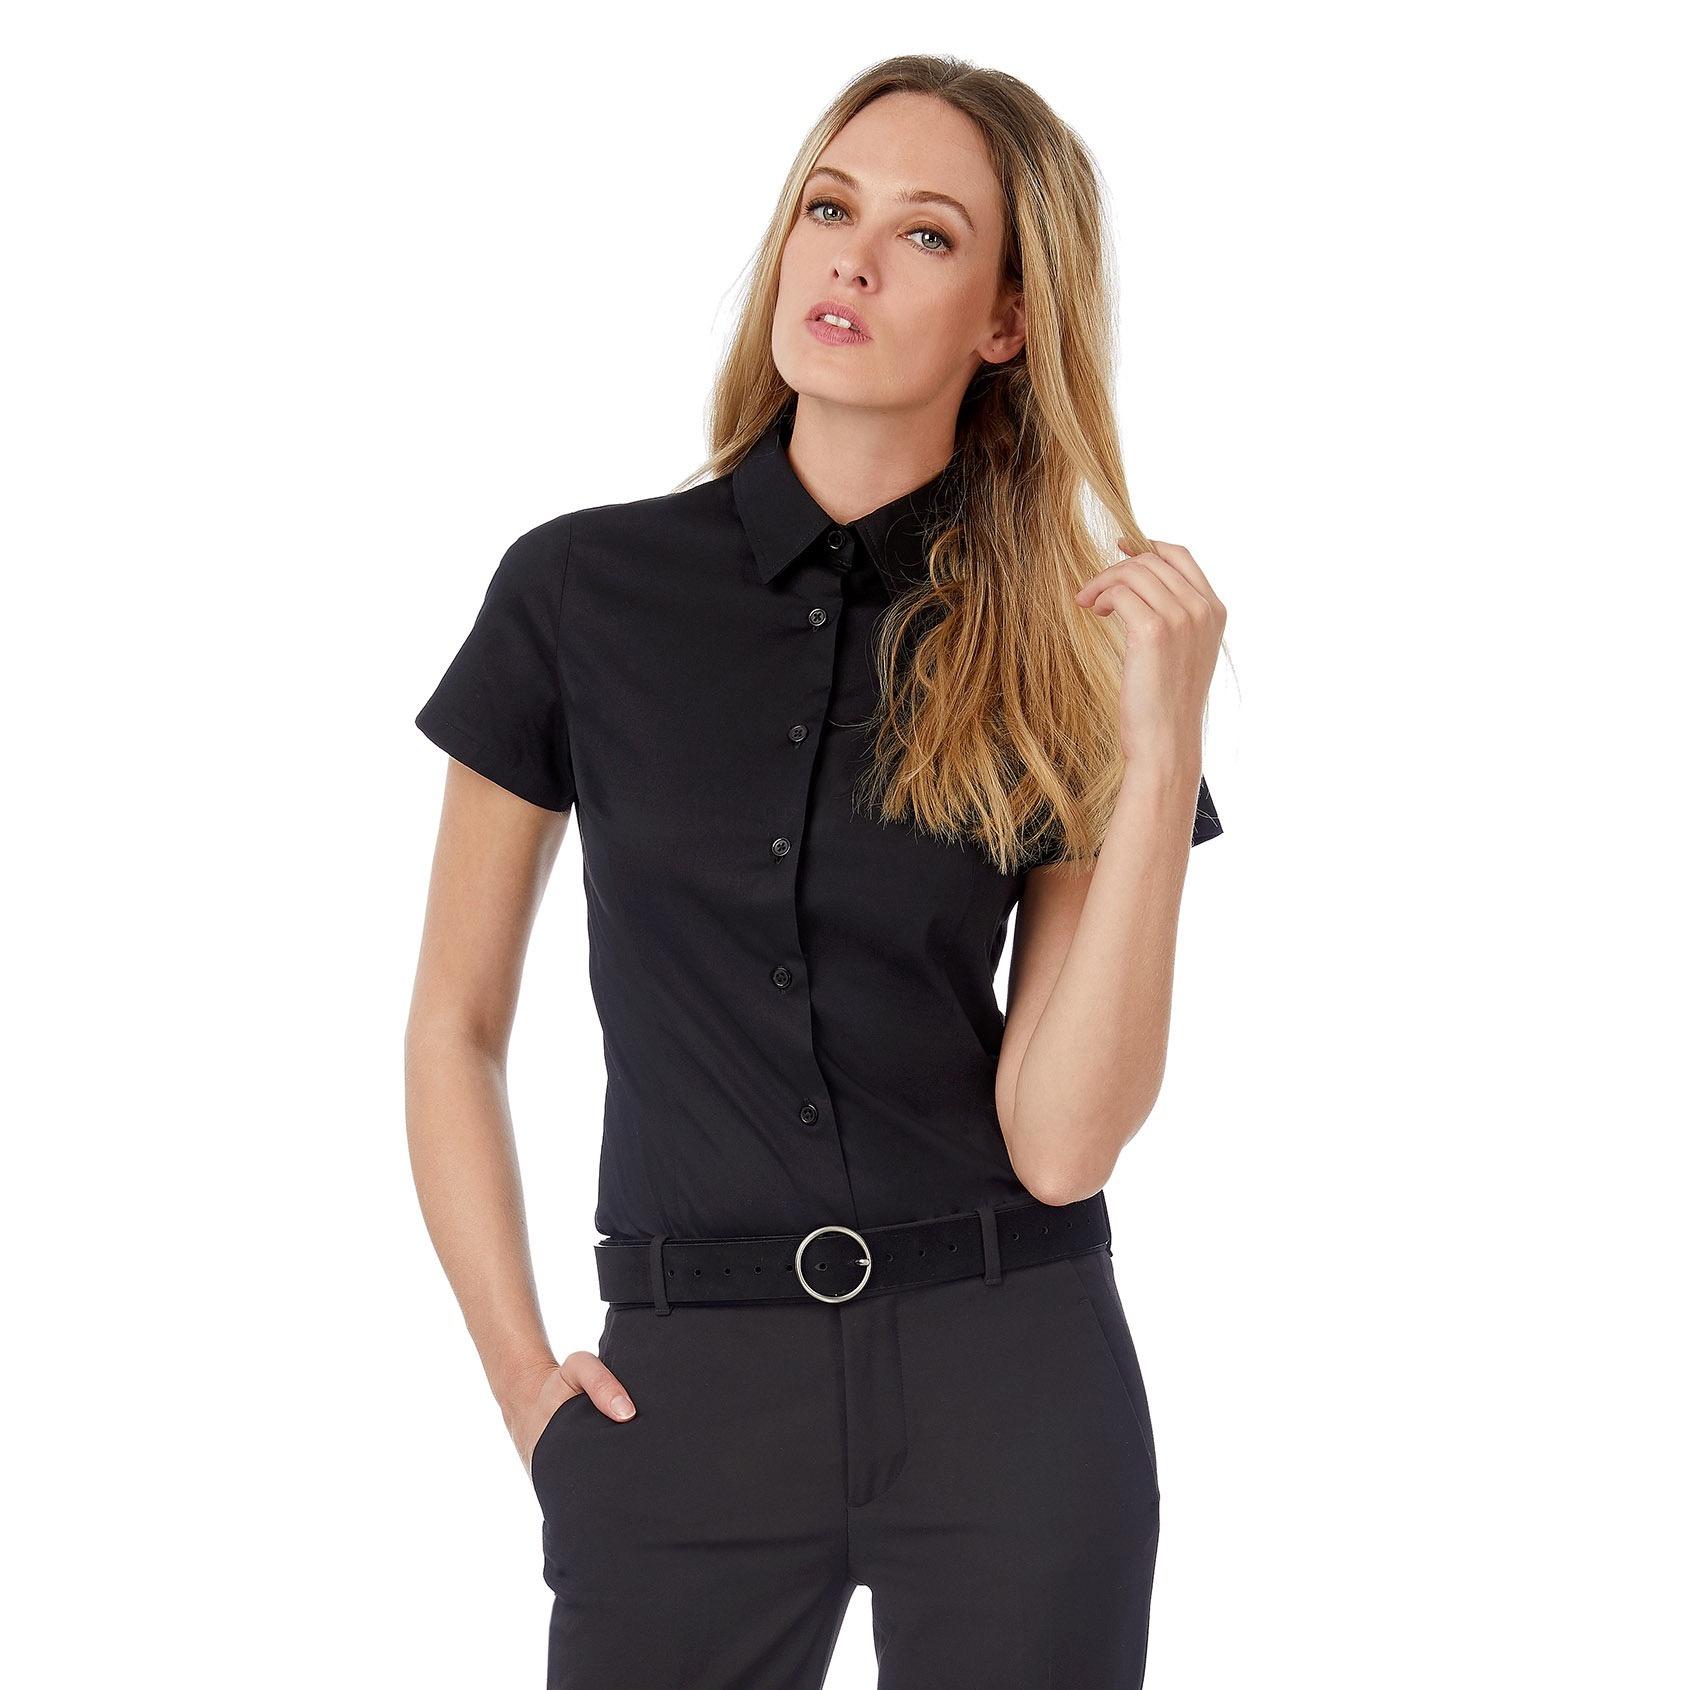 141c48f424 B&C Black Tie SSL /women | B&C Collection